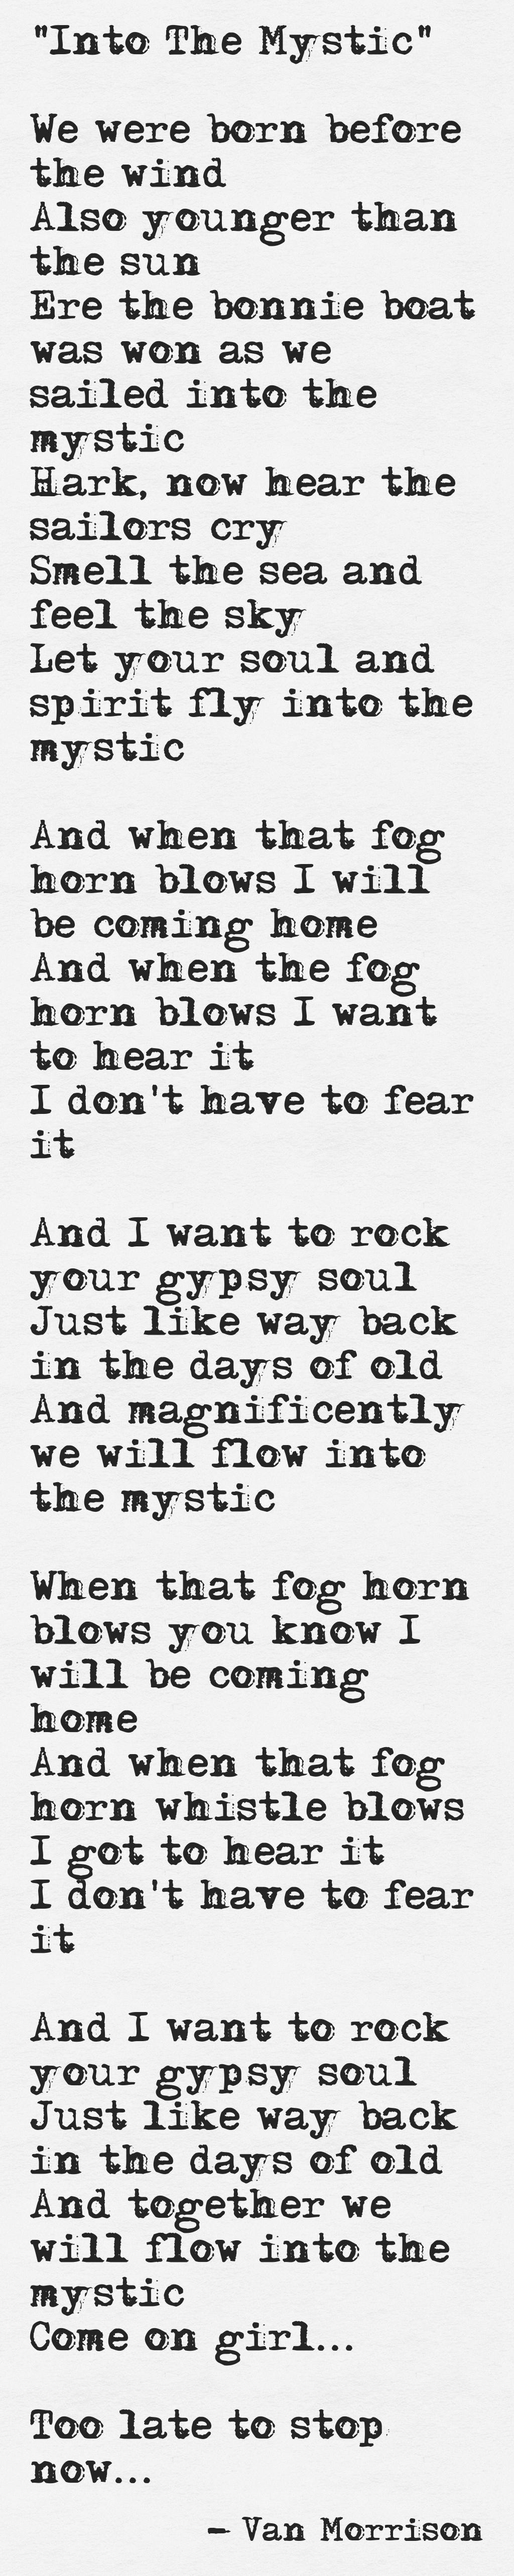 Mystic – The Life Lyrics | Genius Lyrics